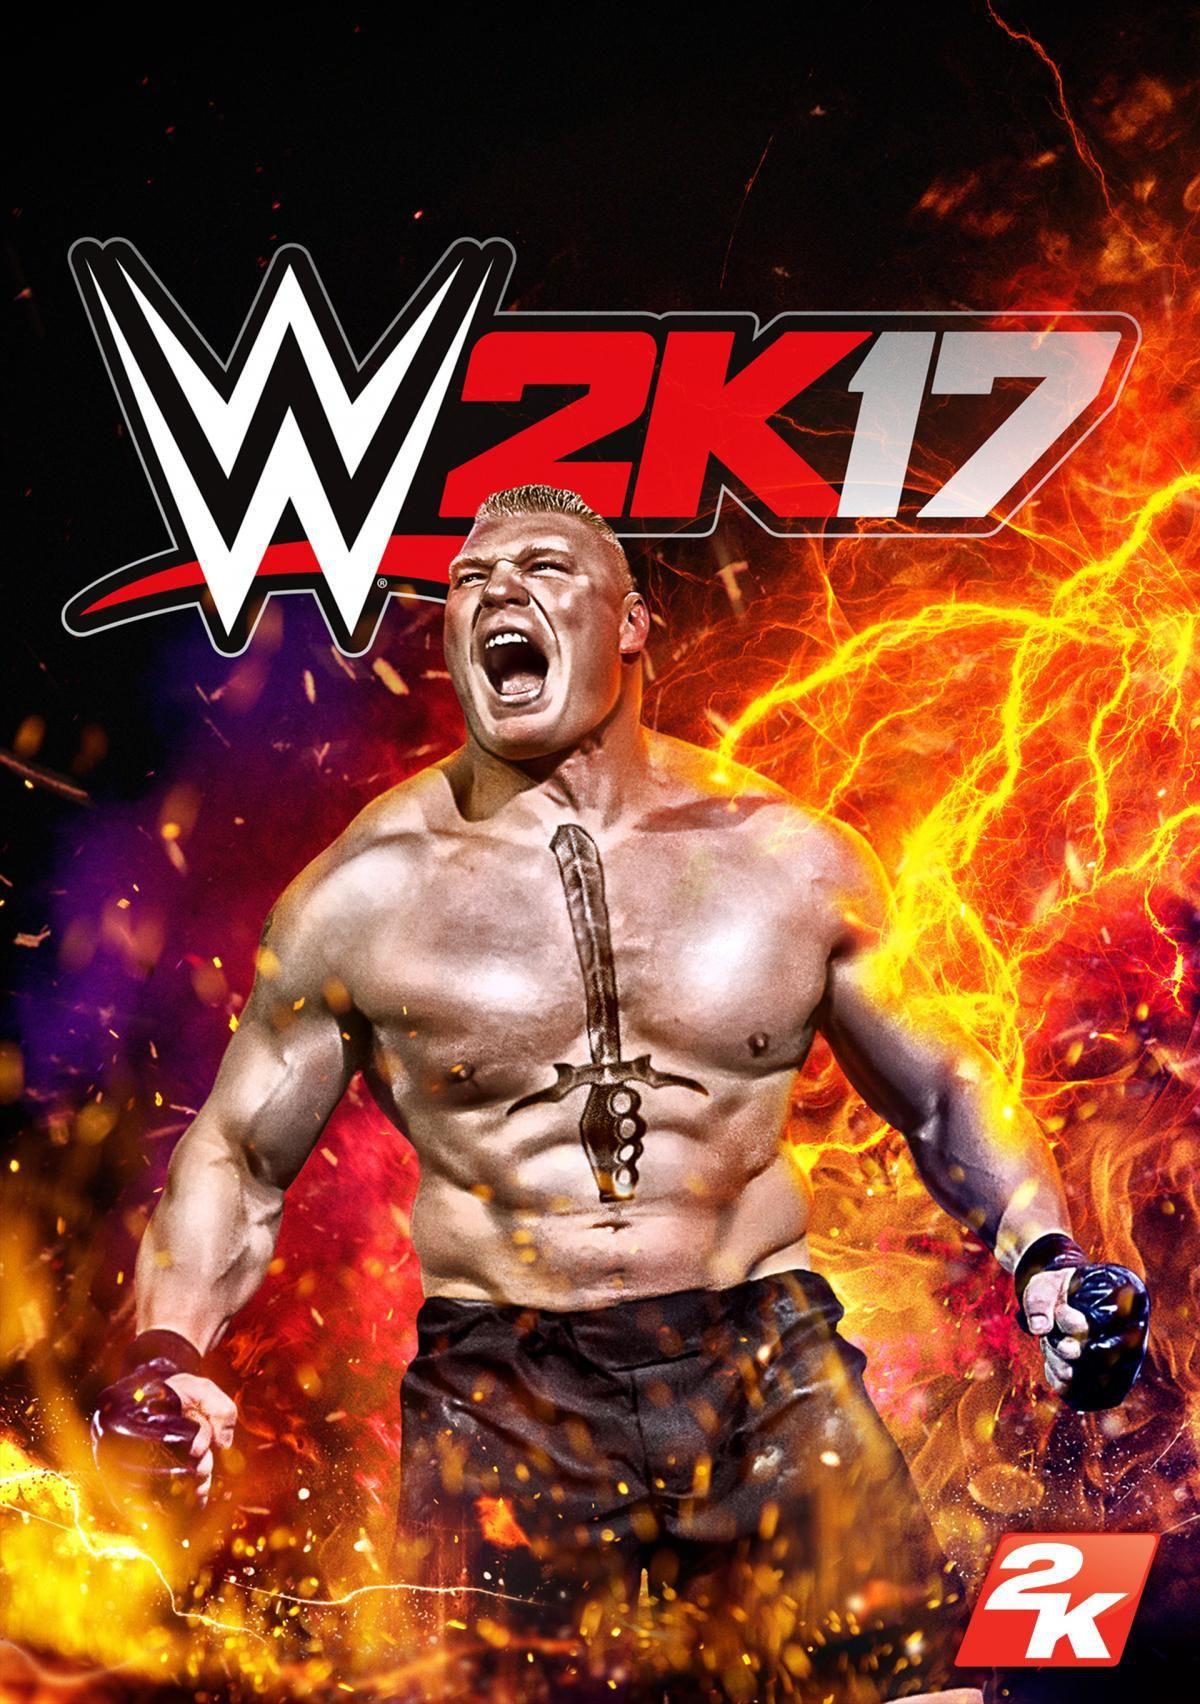 WWE 2k17 Cover look? #wwe #wwe2k17